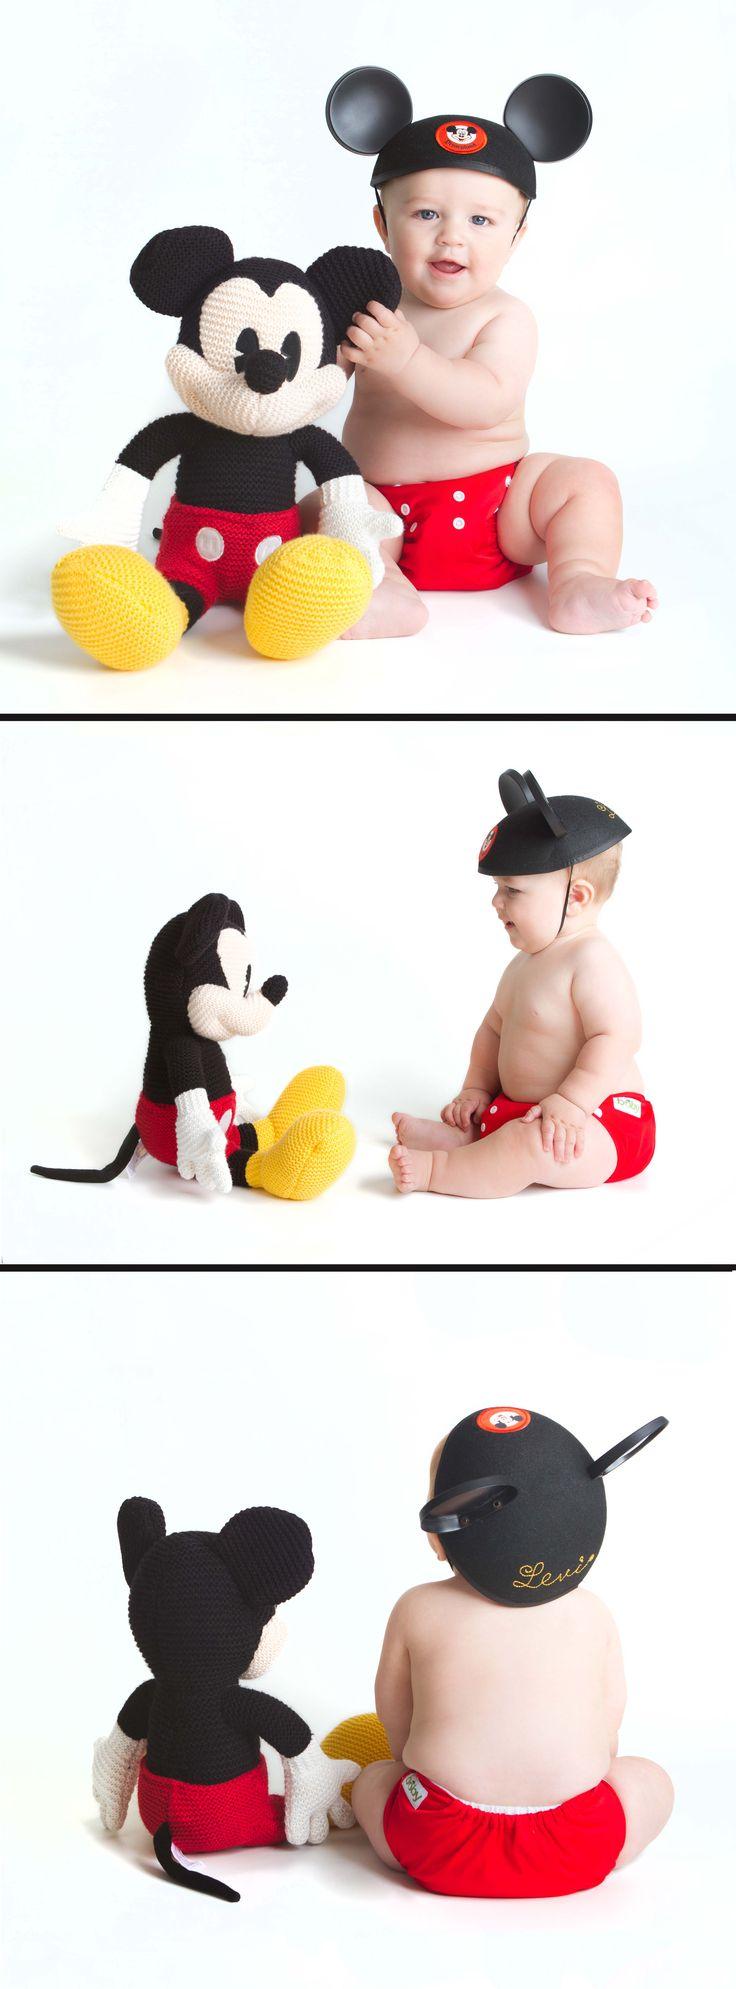 #Disney #Baby #Mickey   Sacramento Wedding & Portrait Photographers   Photo Booth Rentals   Anfinson Photography